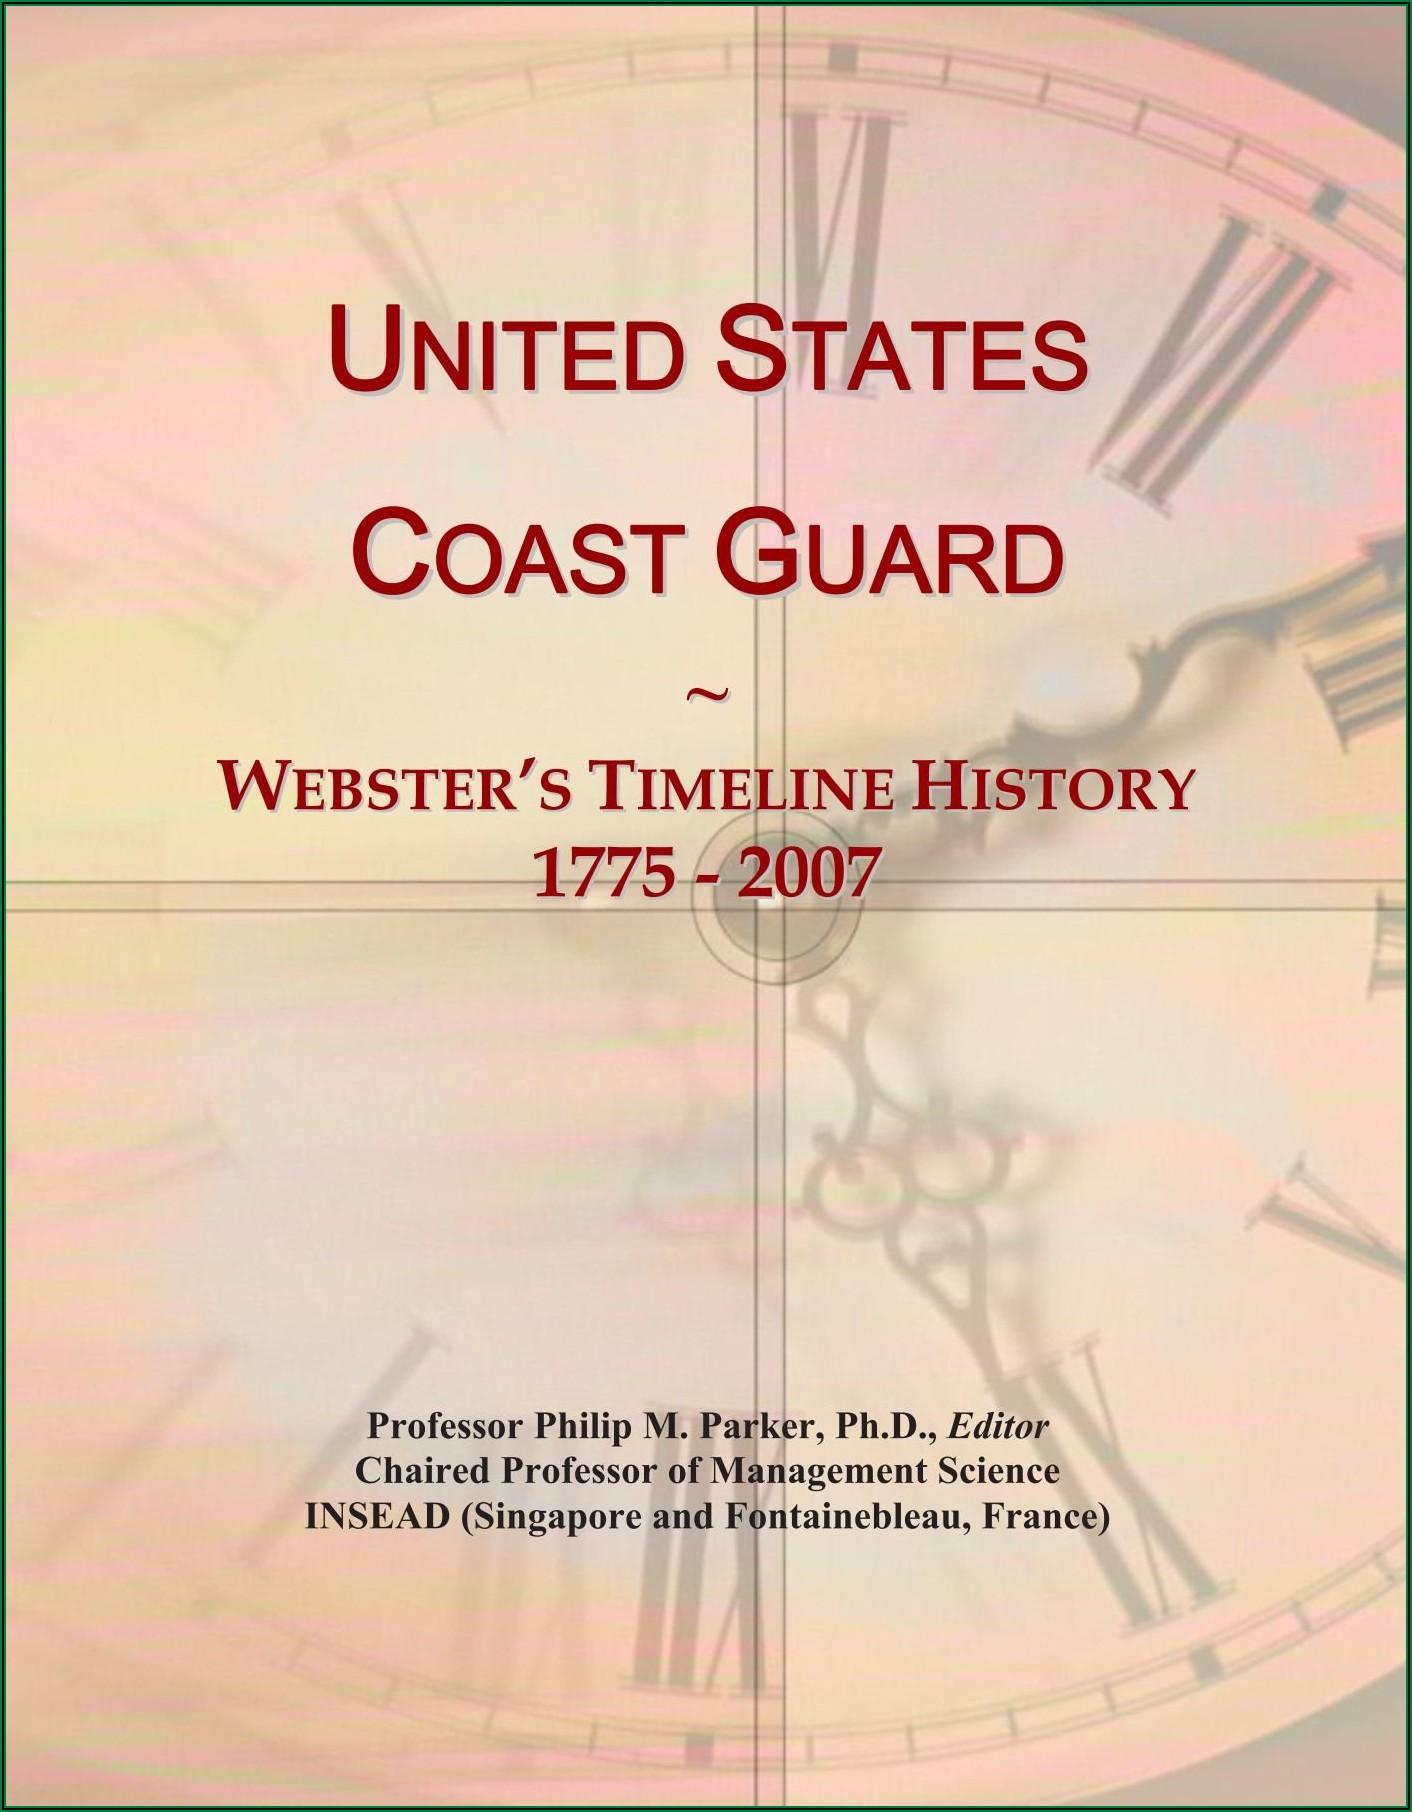 Coast Guard History Timeline